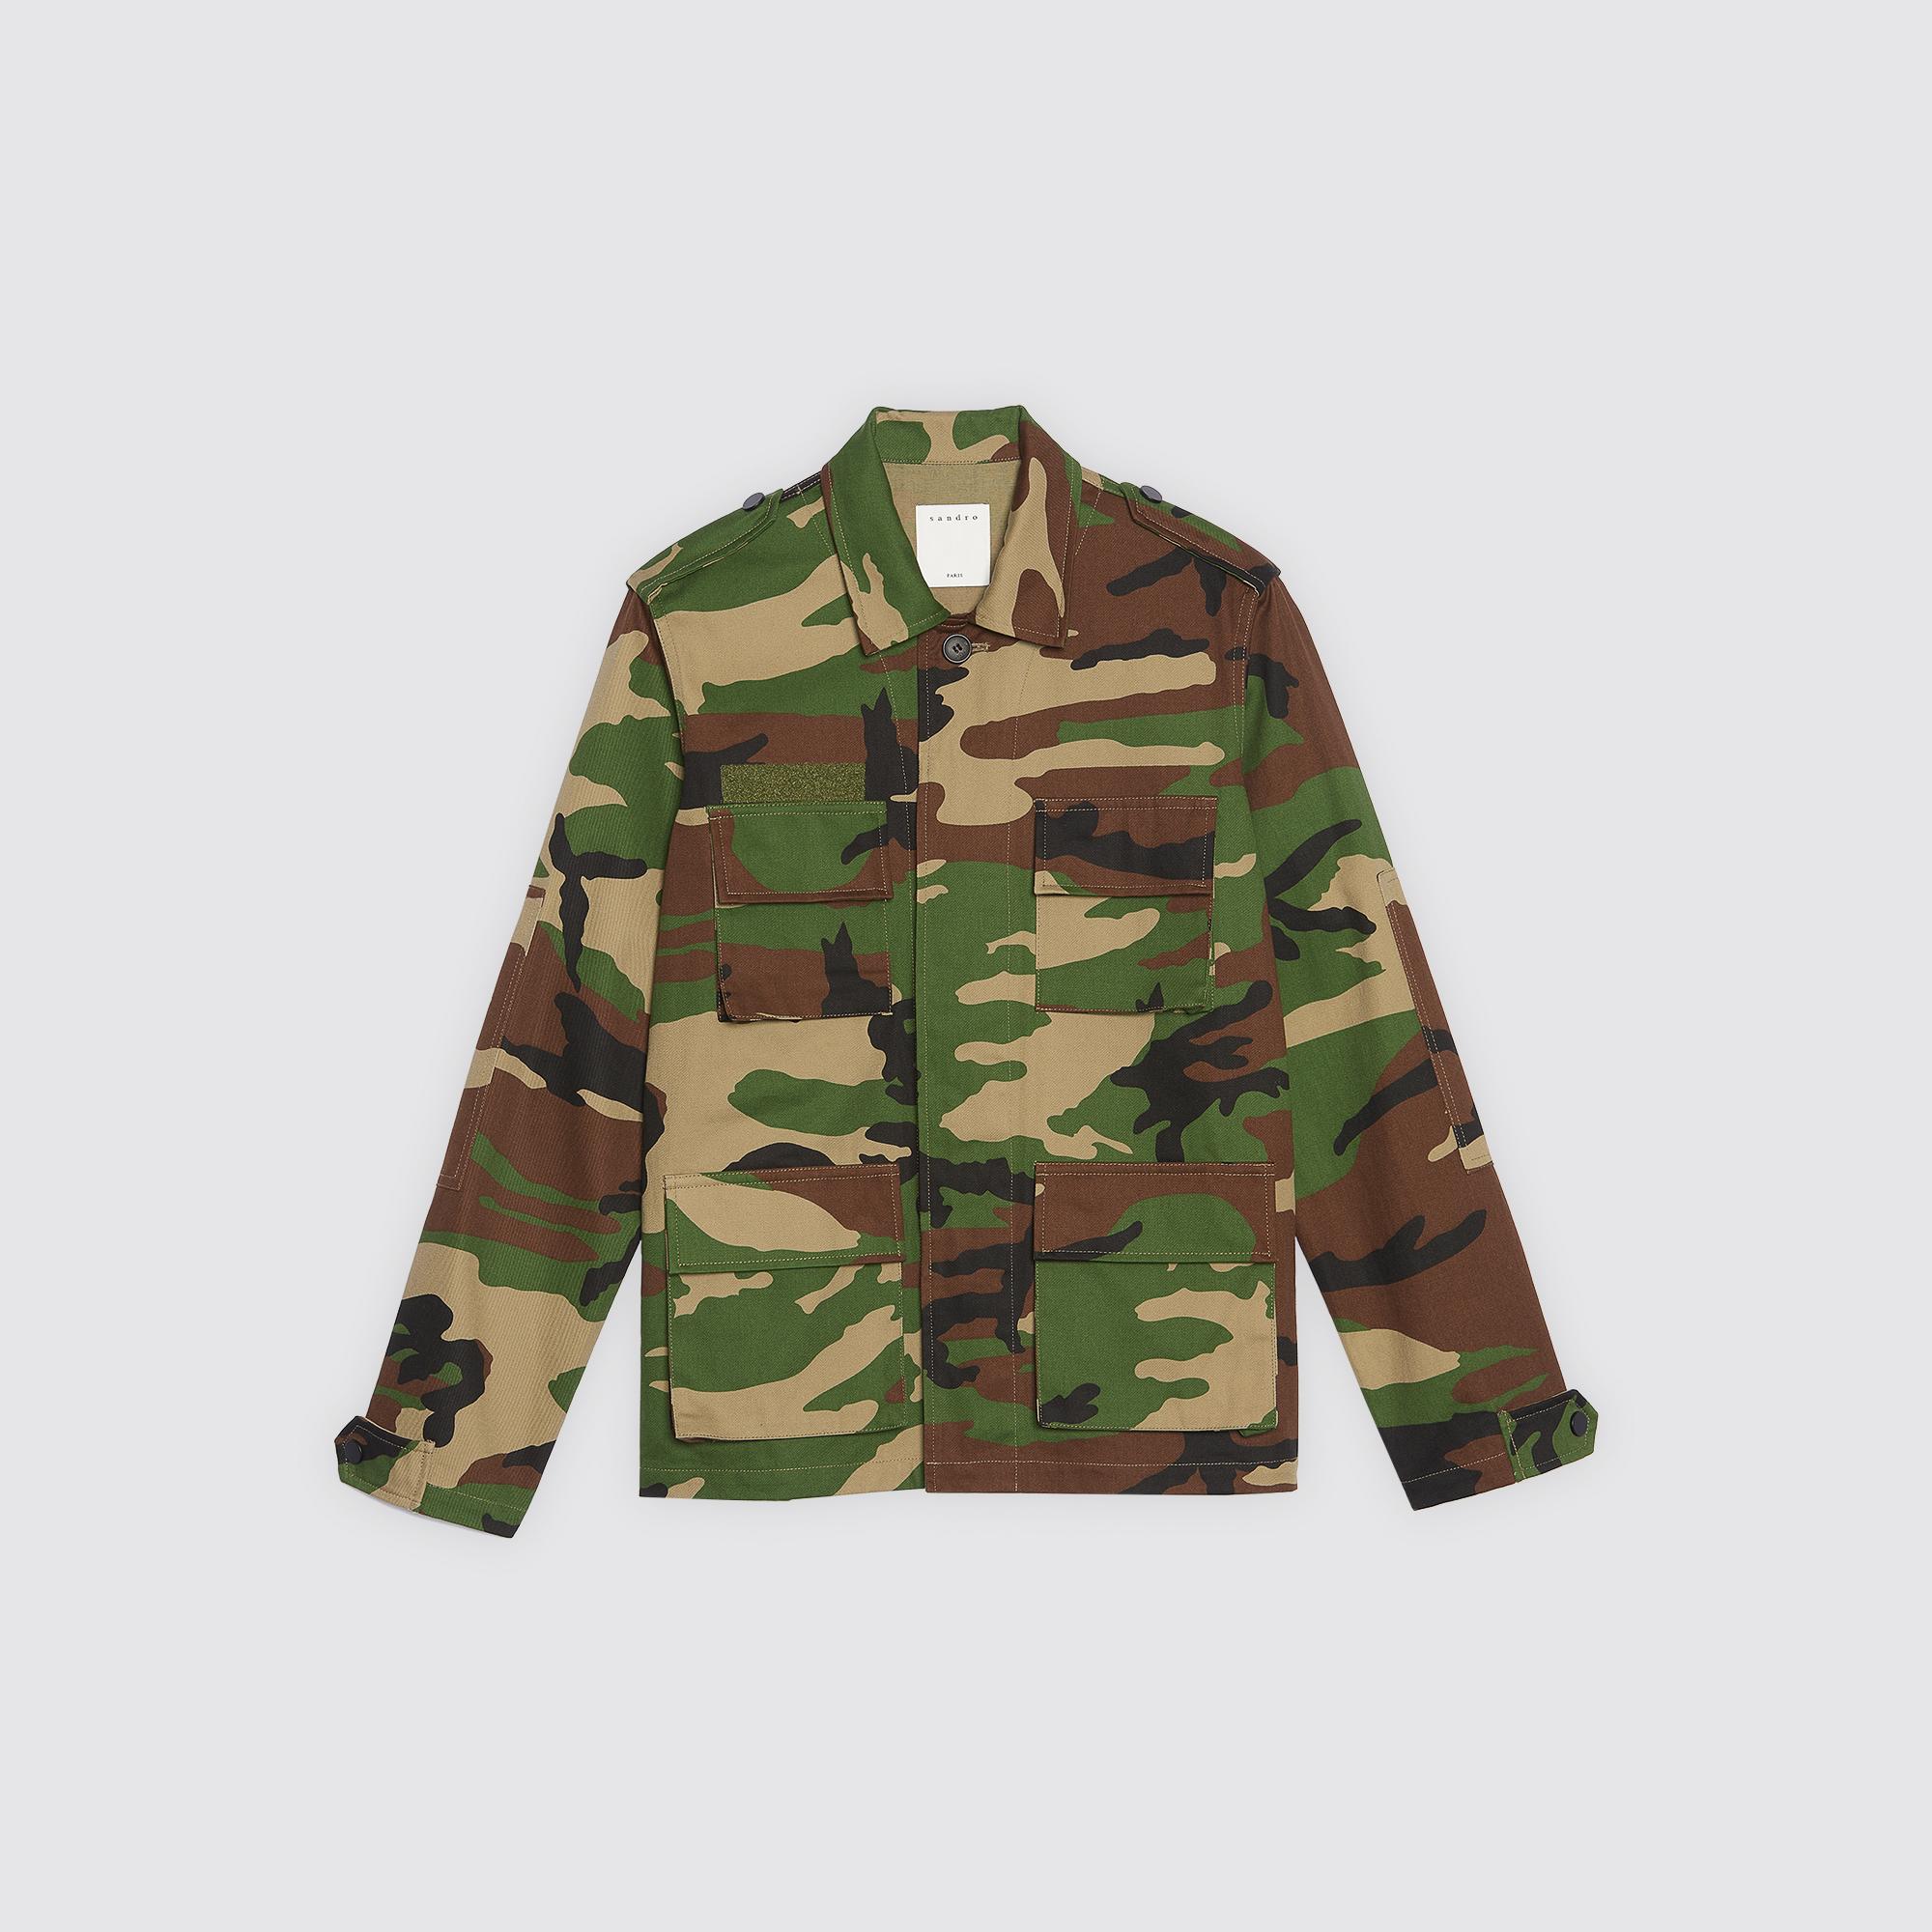 7f164514 ... Camouflage print jacket : Coats & Jackets color Olive Green